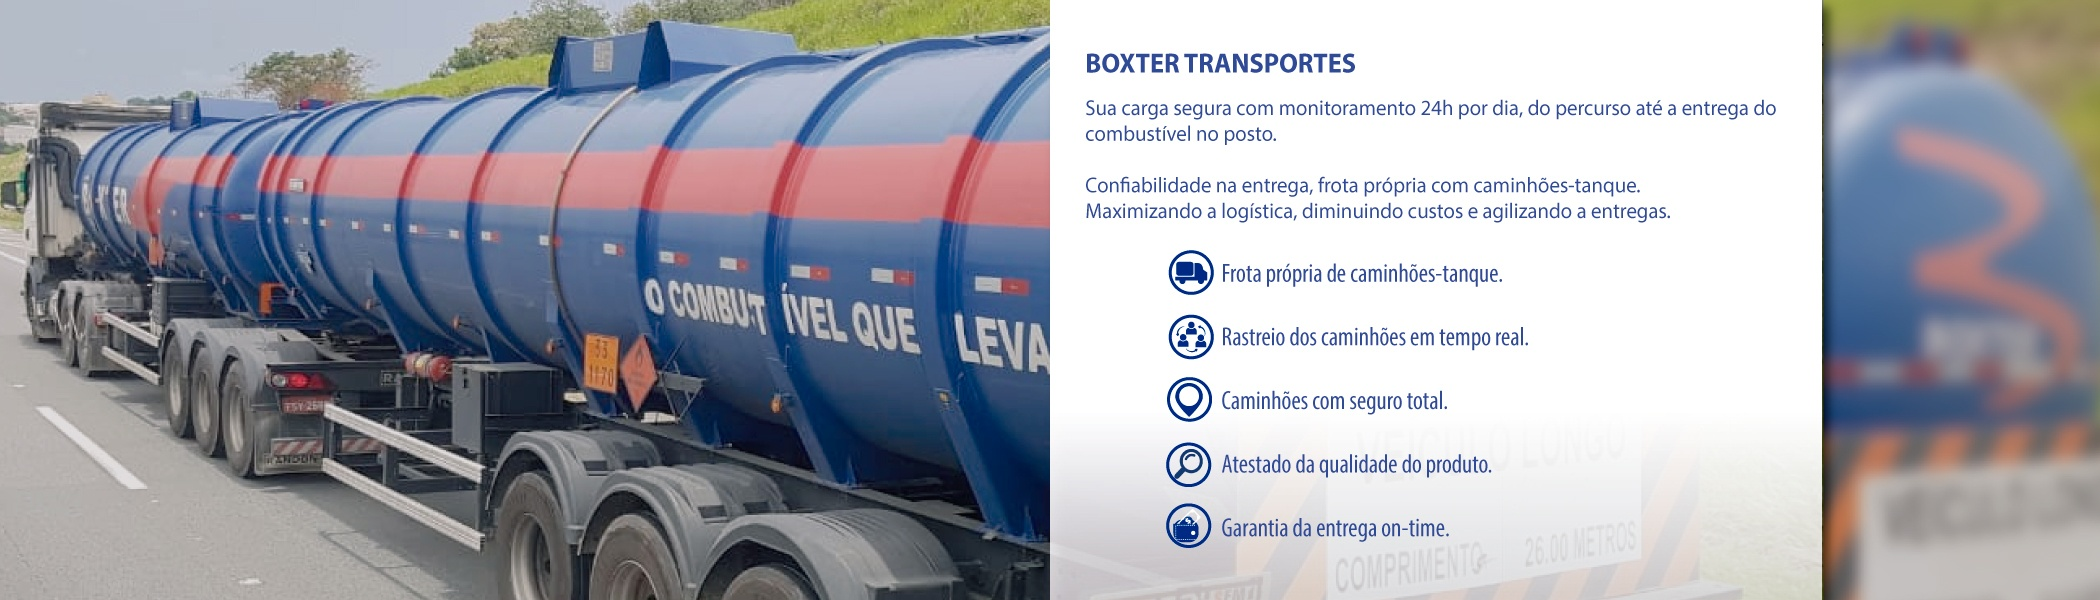 banner-boxter-transporte-222